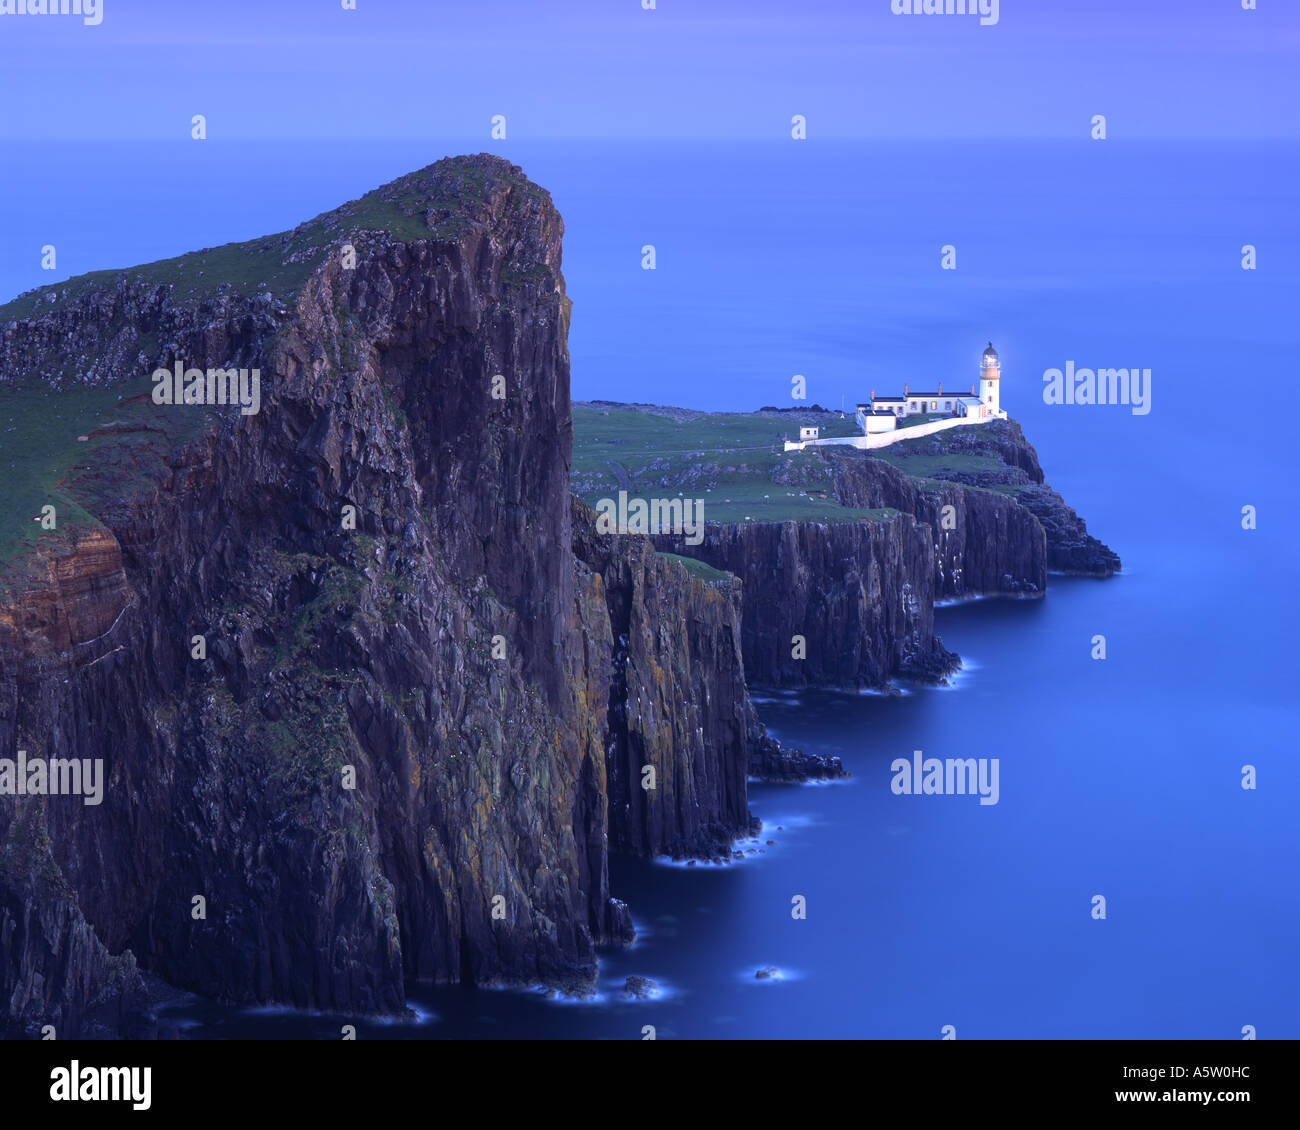 GB - SCOTLAND: Neist Point Lighthouse on the Isle of Skye - Stock Image